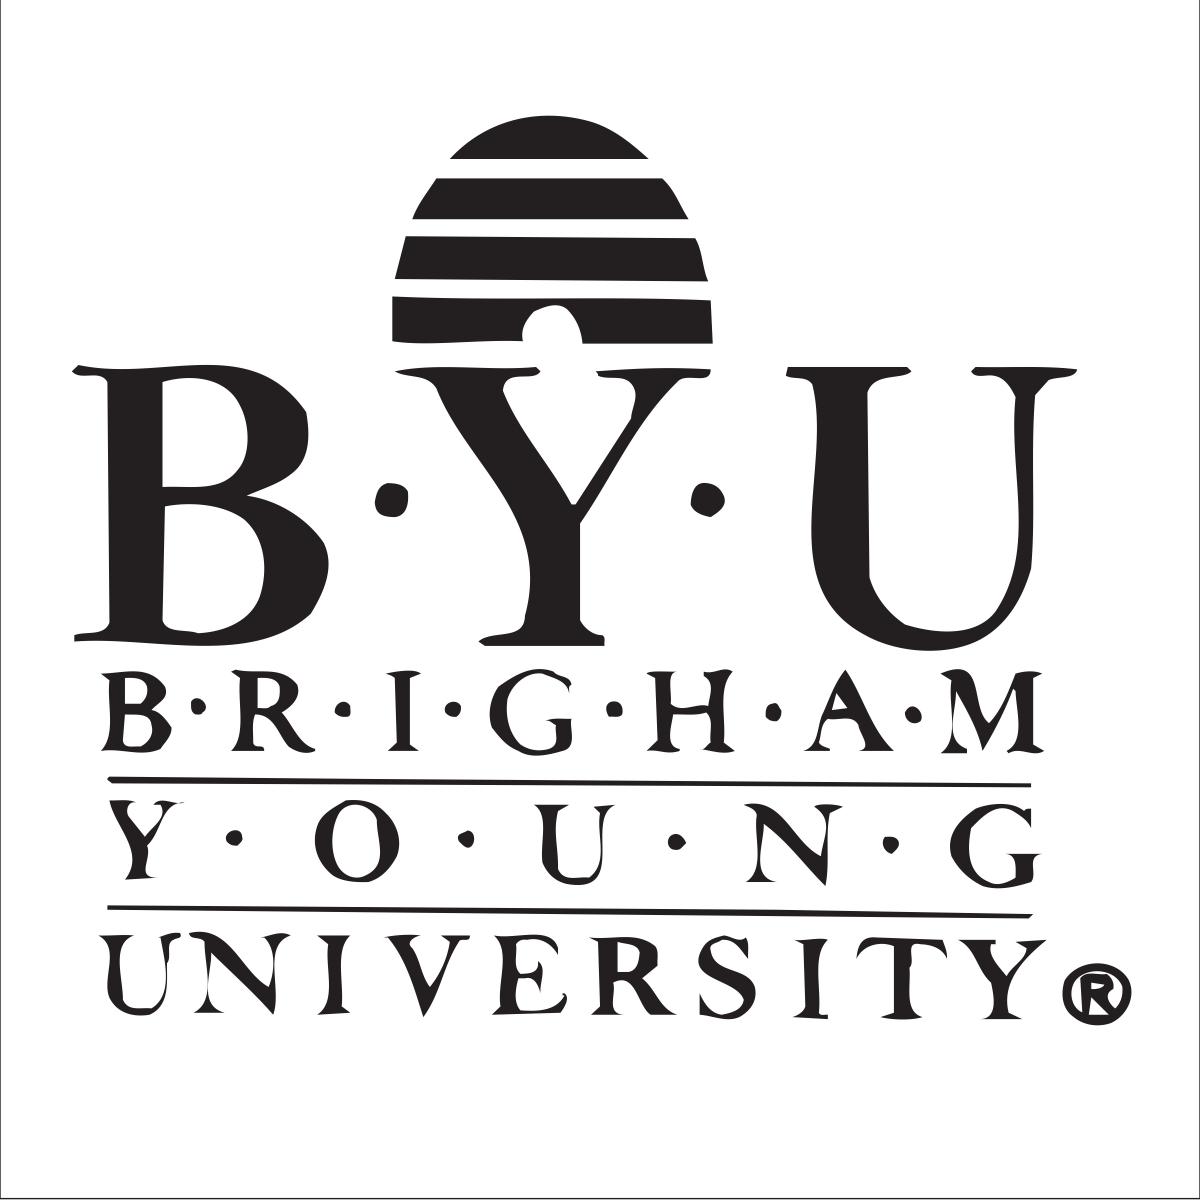 BYU BS in Statistics: Data Science